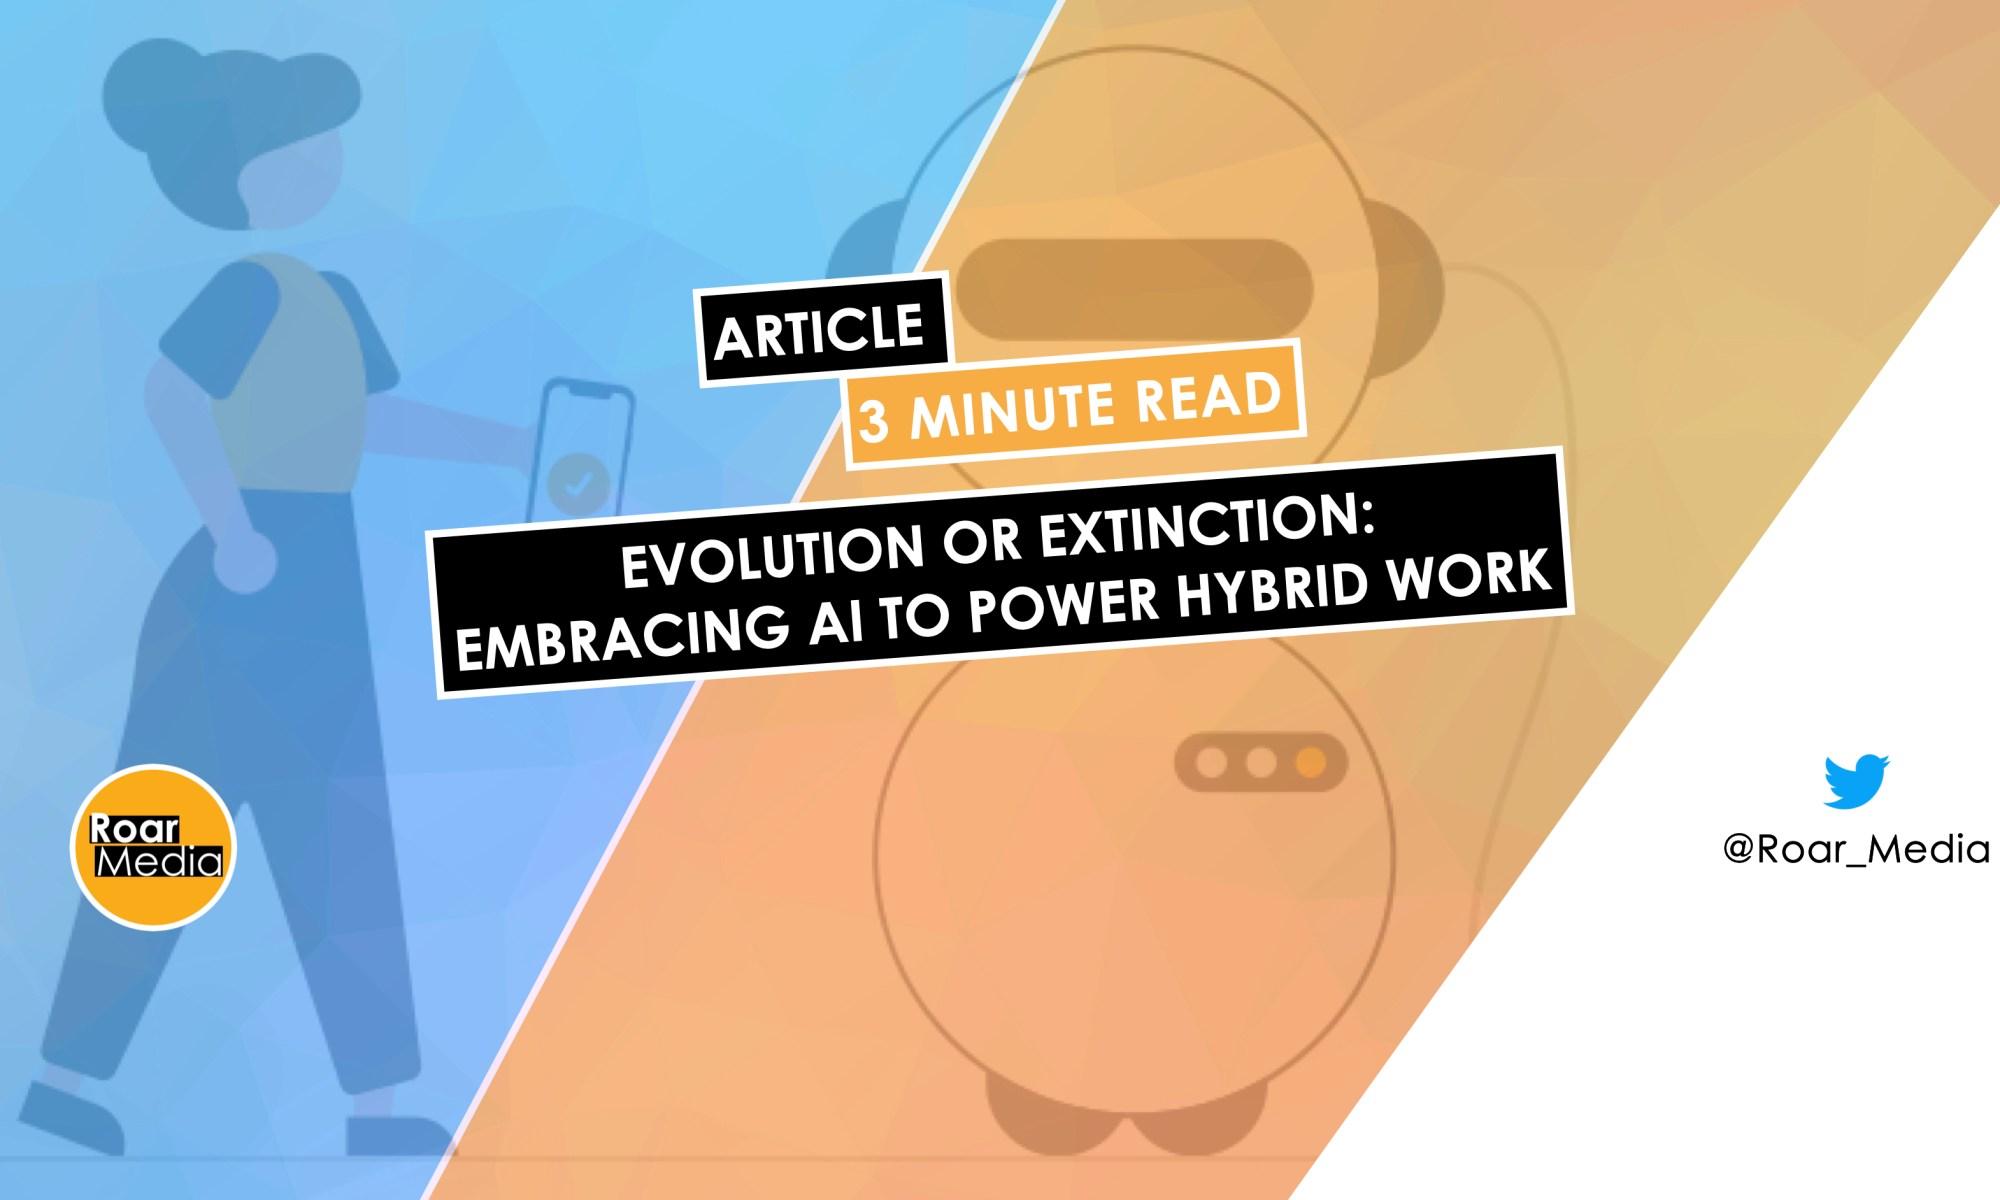 Evolution or Extinction: Embracing AI To Power Hybrid Work